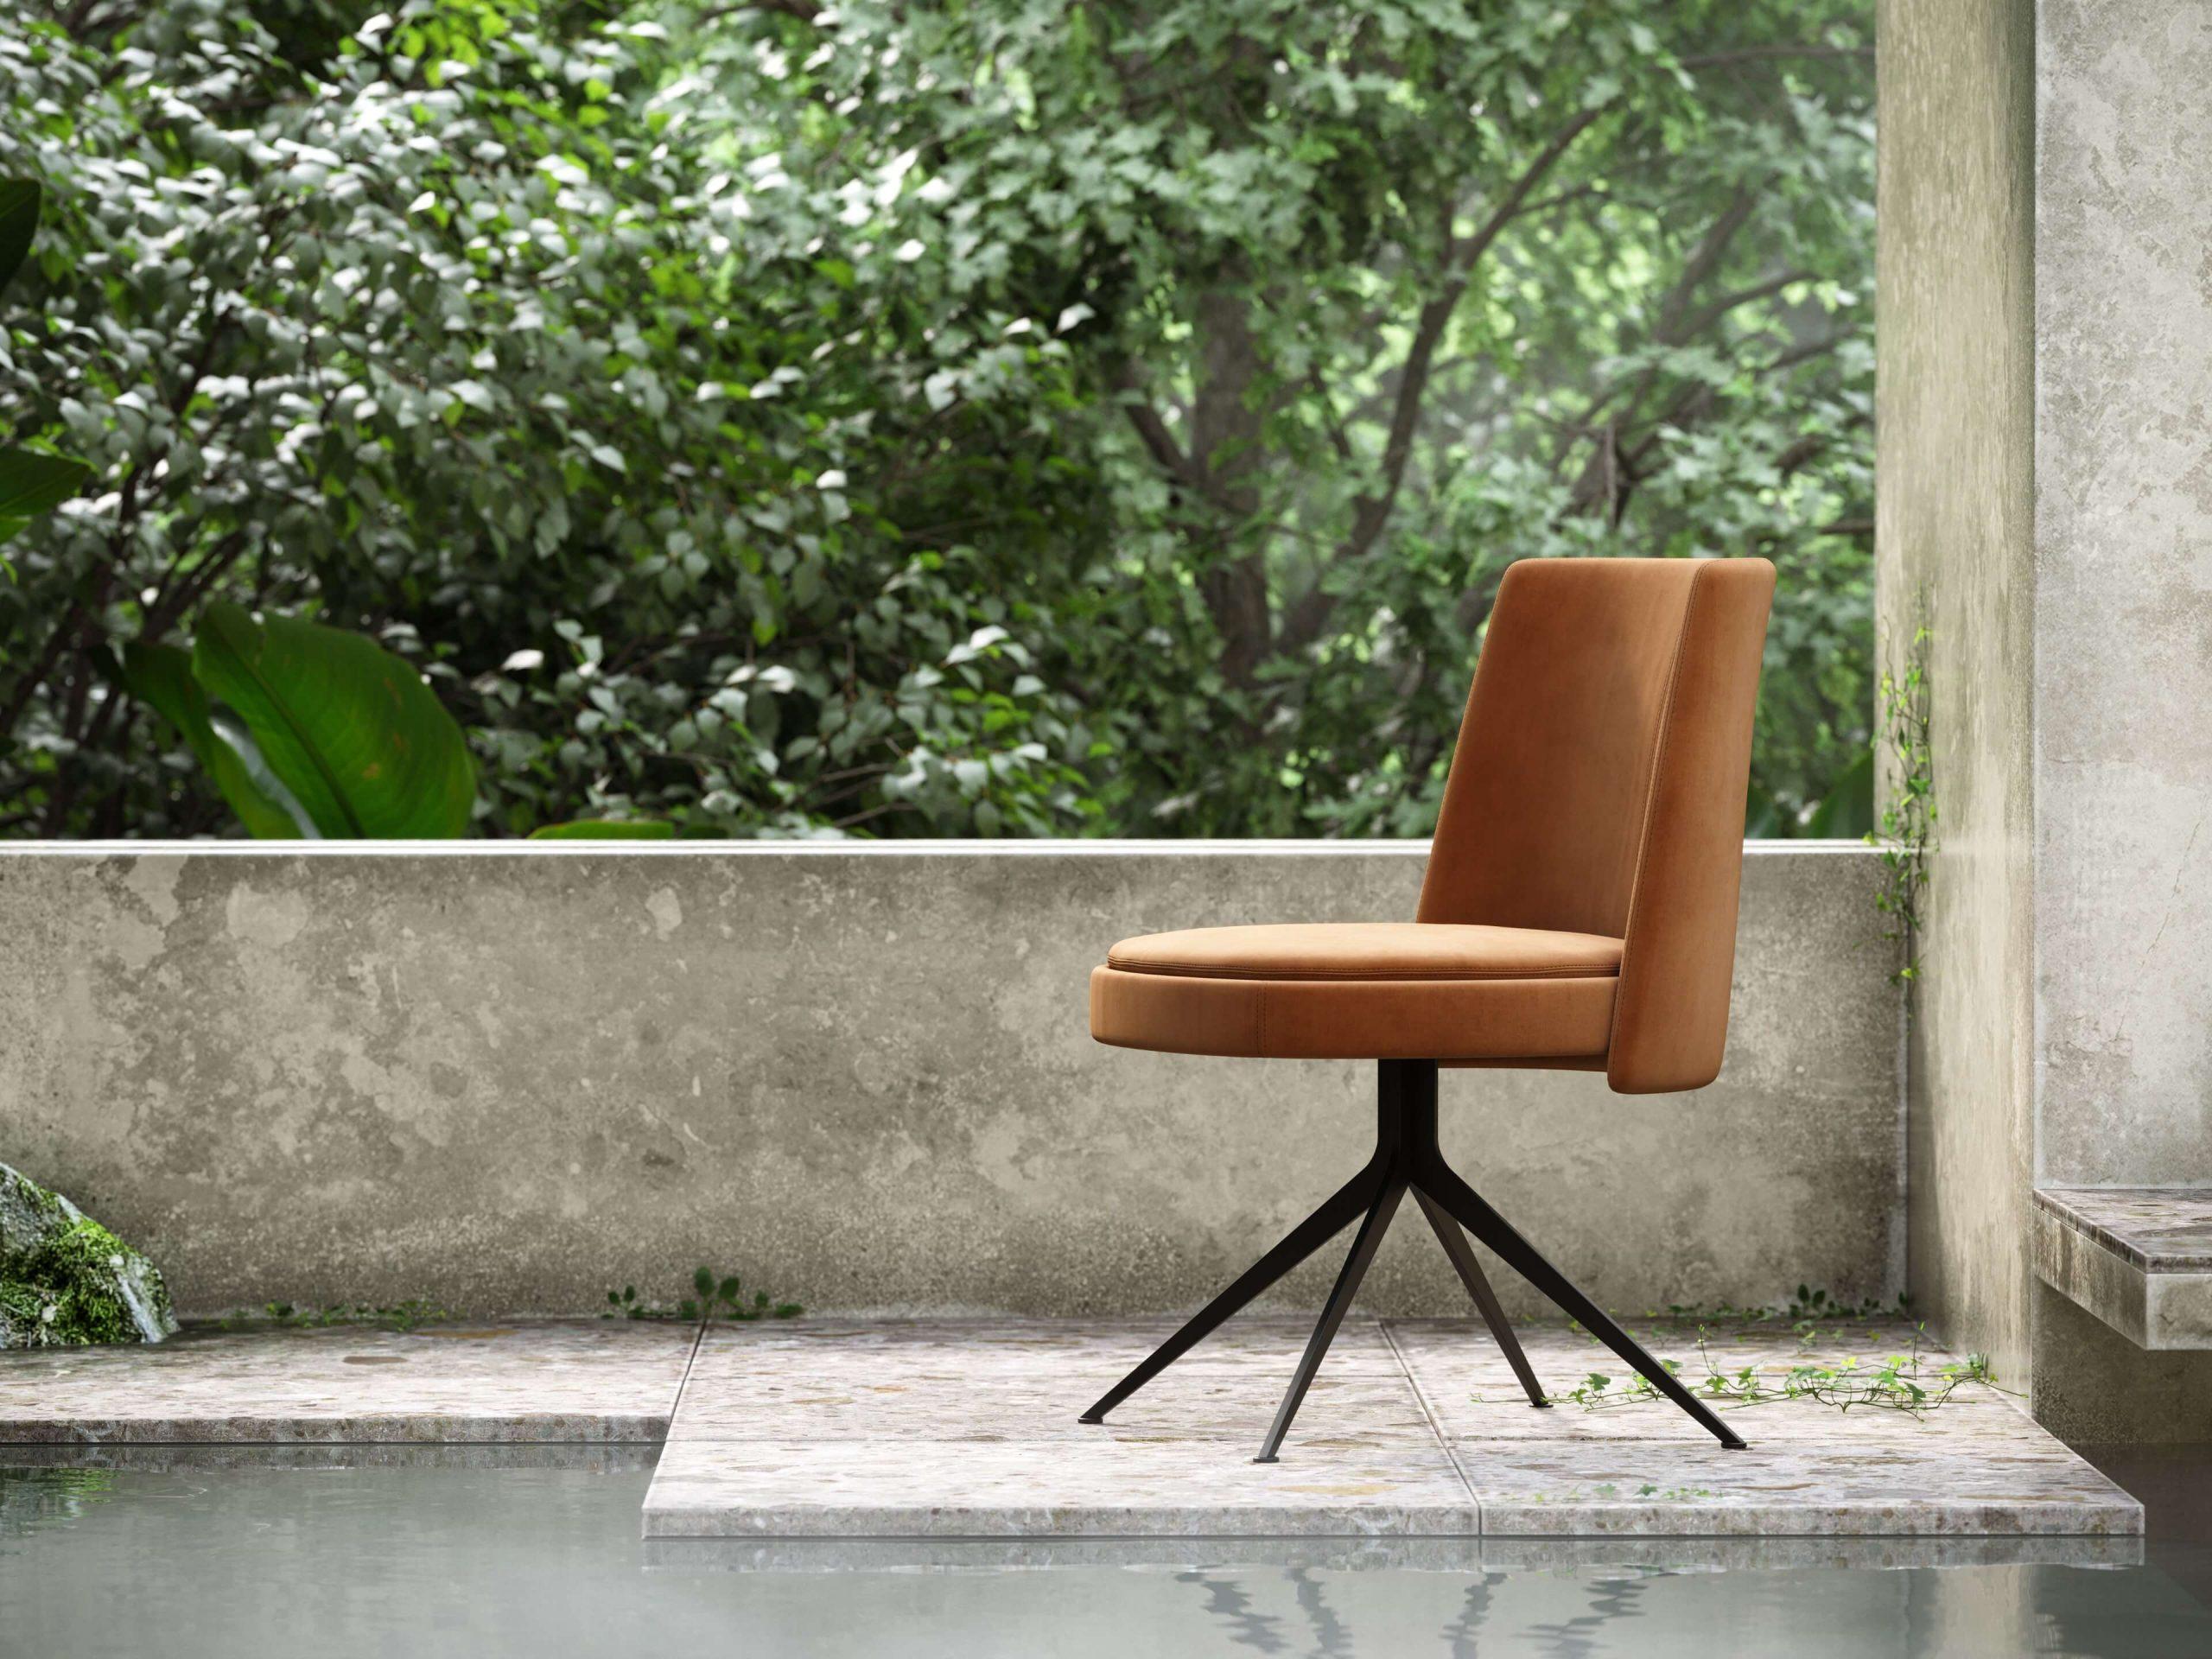 nouveau-chair-velvet-black-steel-legs-dining-room-domkapa